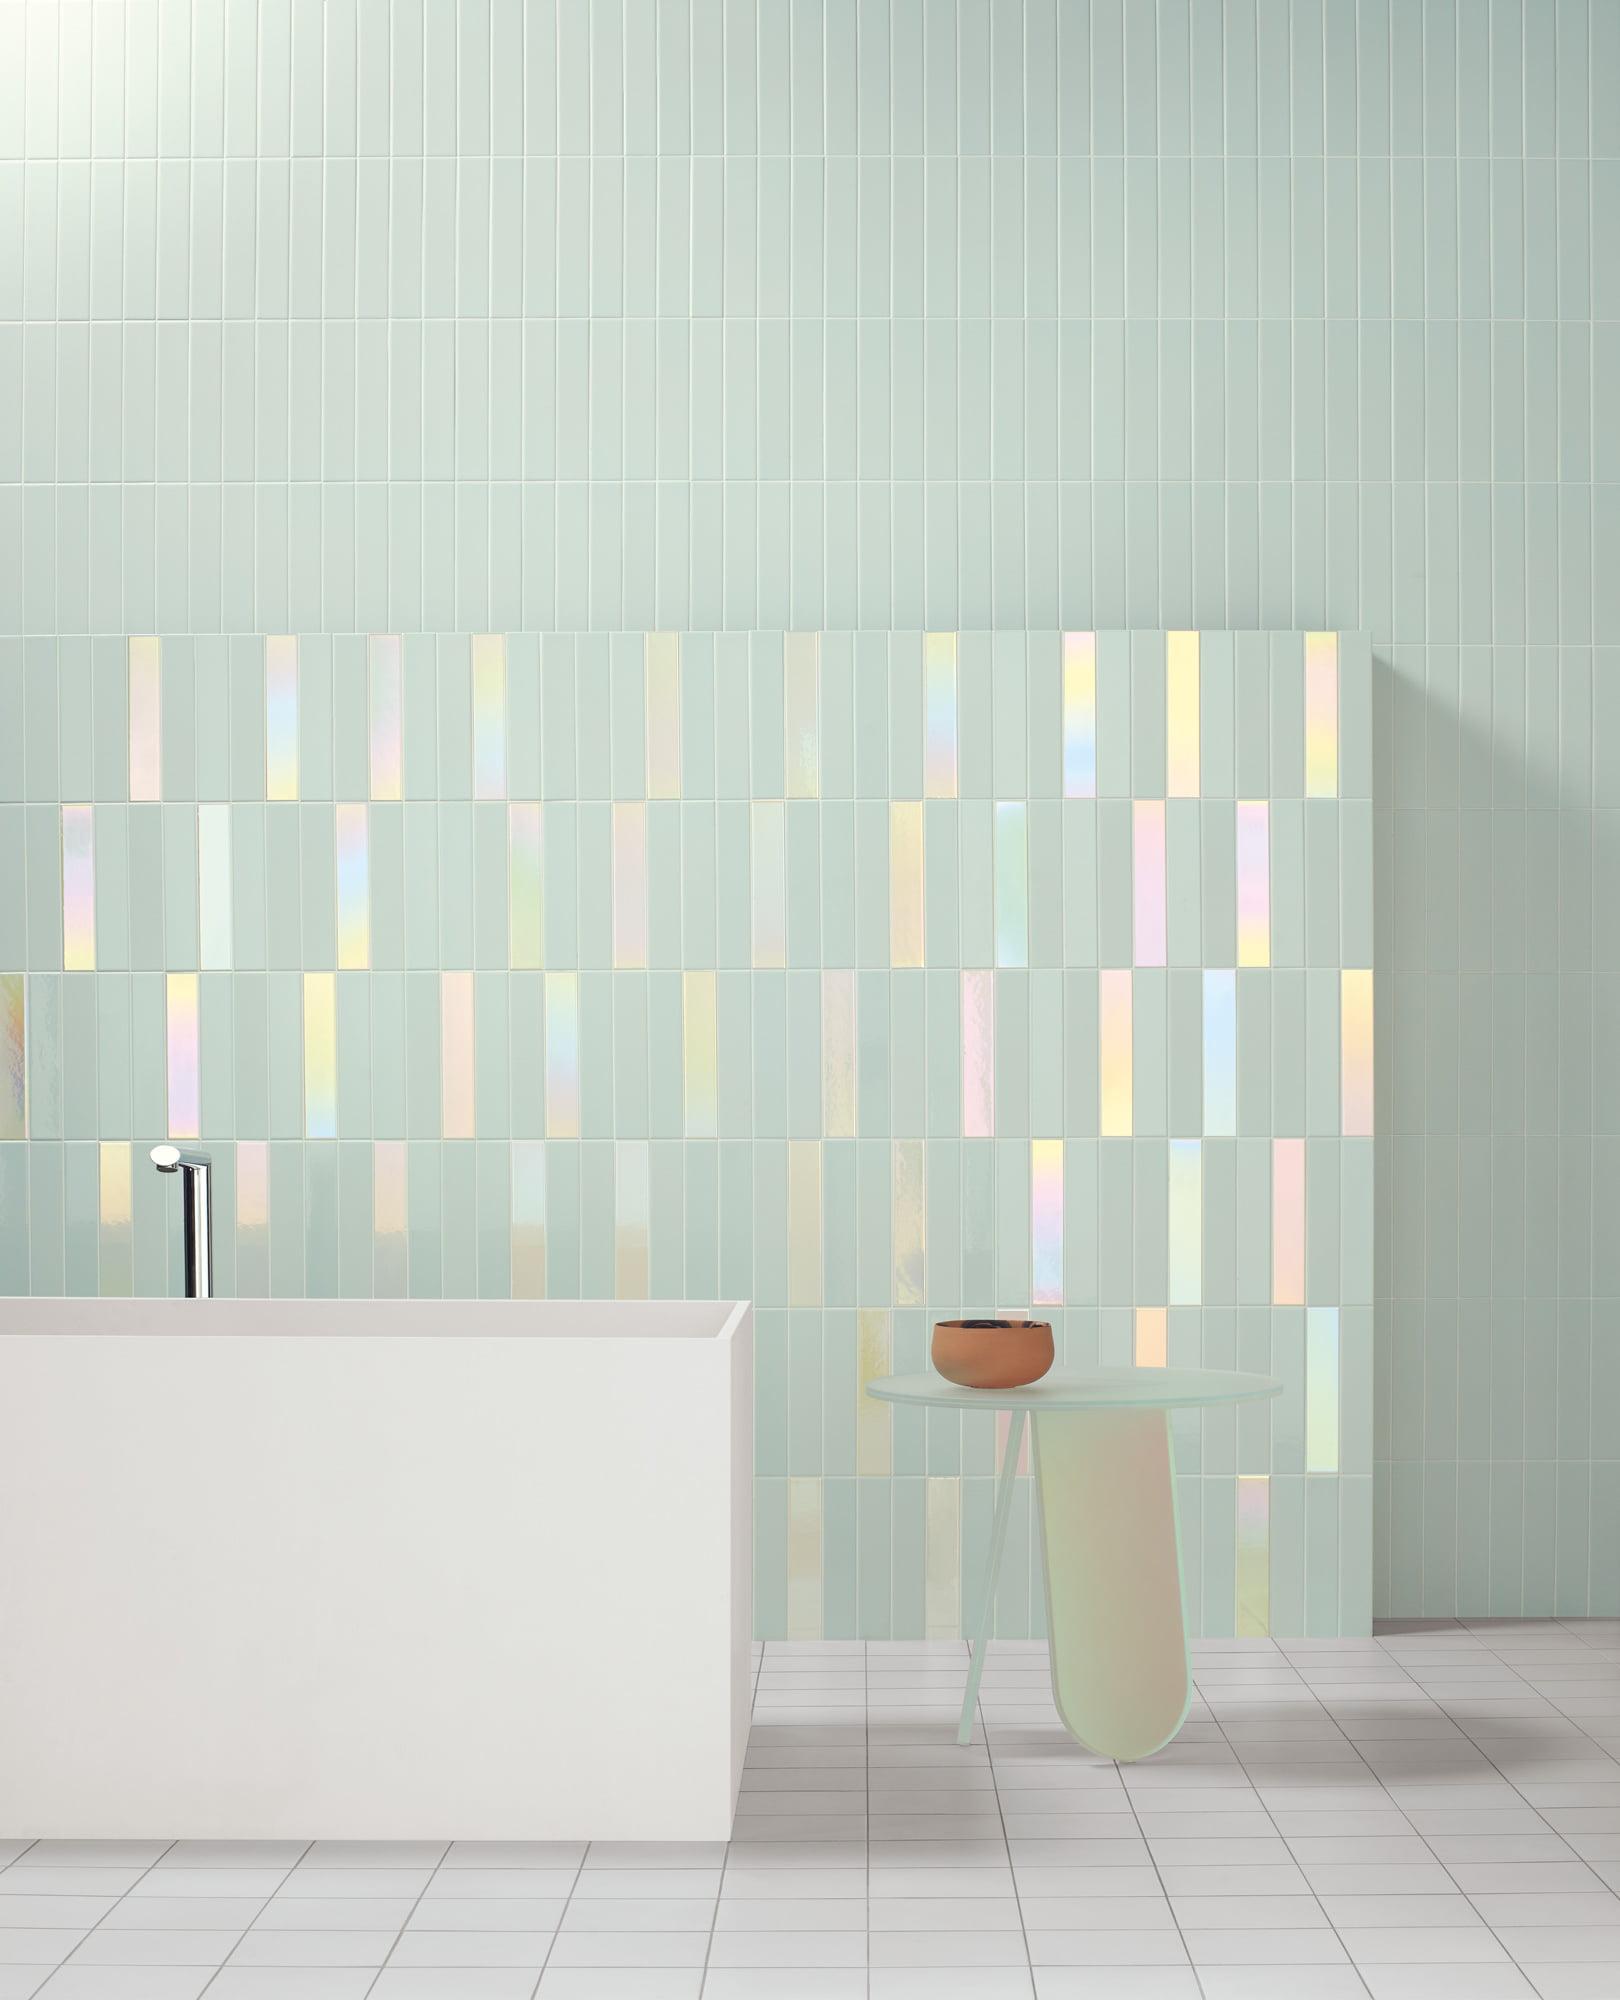 "Wall Spectre Sky Matte 5x25 2""x10""  / Spectre Sky Hologram 5x25 2""x10""  - Floor Futura White 15x15 6""x6"""